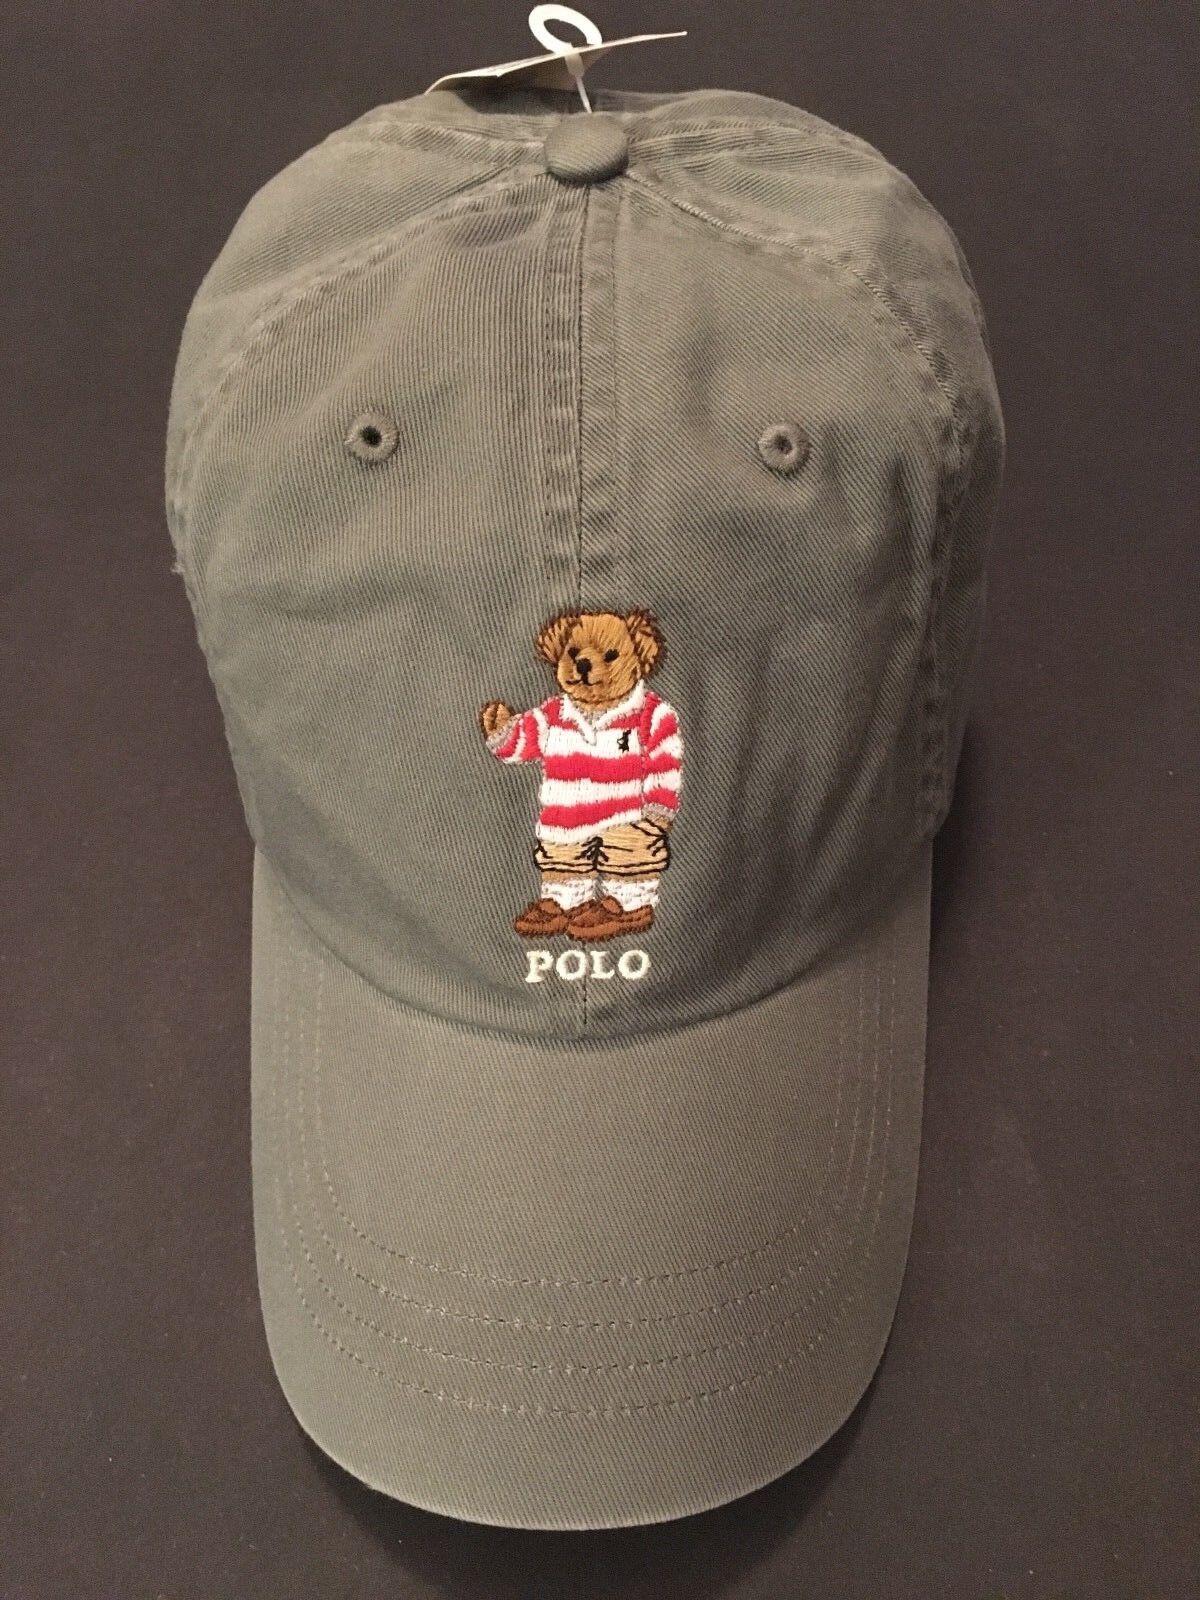 Polo Baseball Ralph Lauren Bear Hat Baseball Polo Cap NWT Gray 100% Authentic 08dc8c